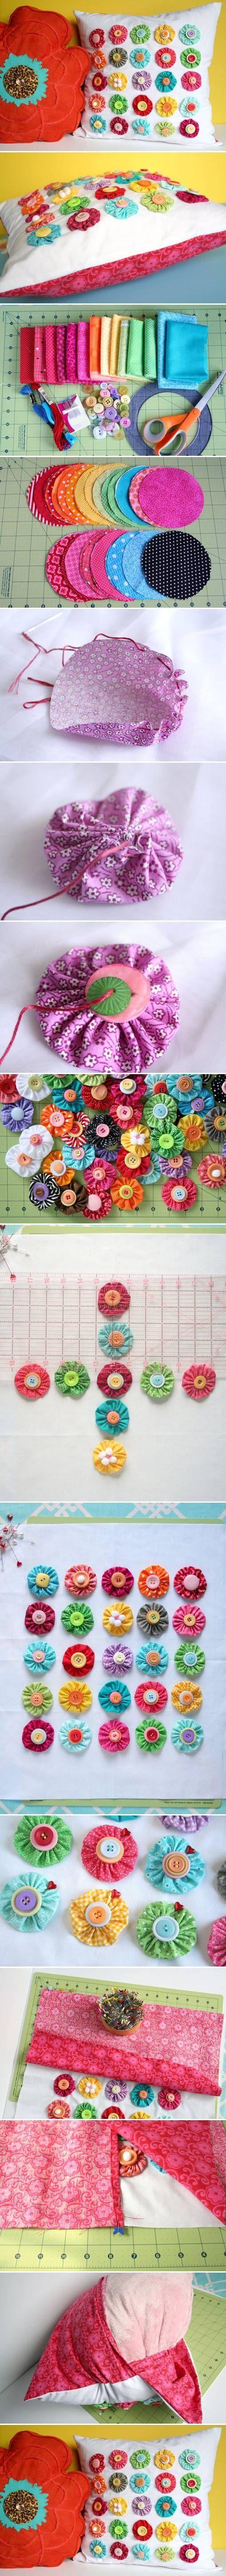 DIY Fabric Decorative Flowers DIY Fabric Decorative Flowers by diyforever